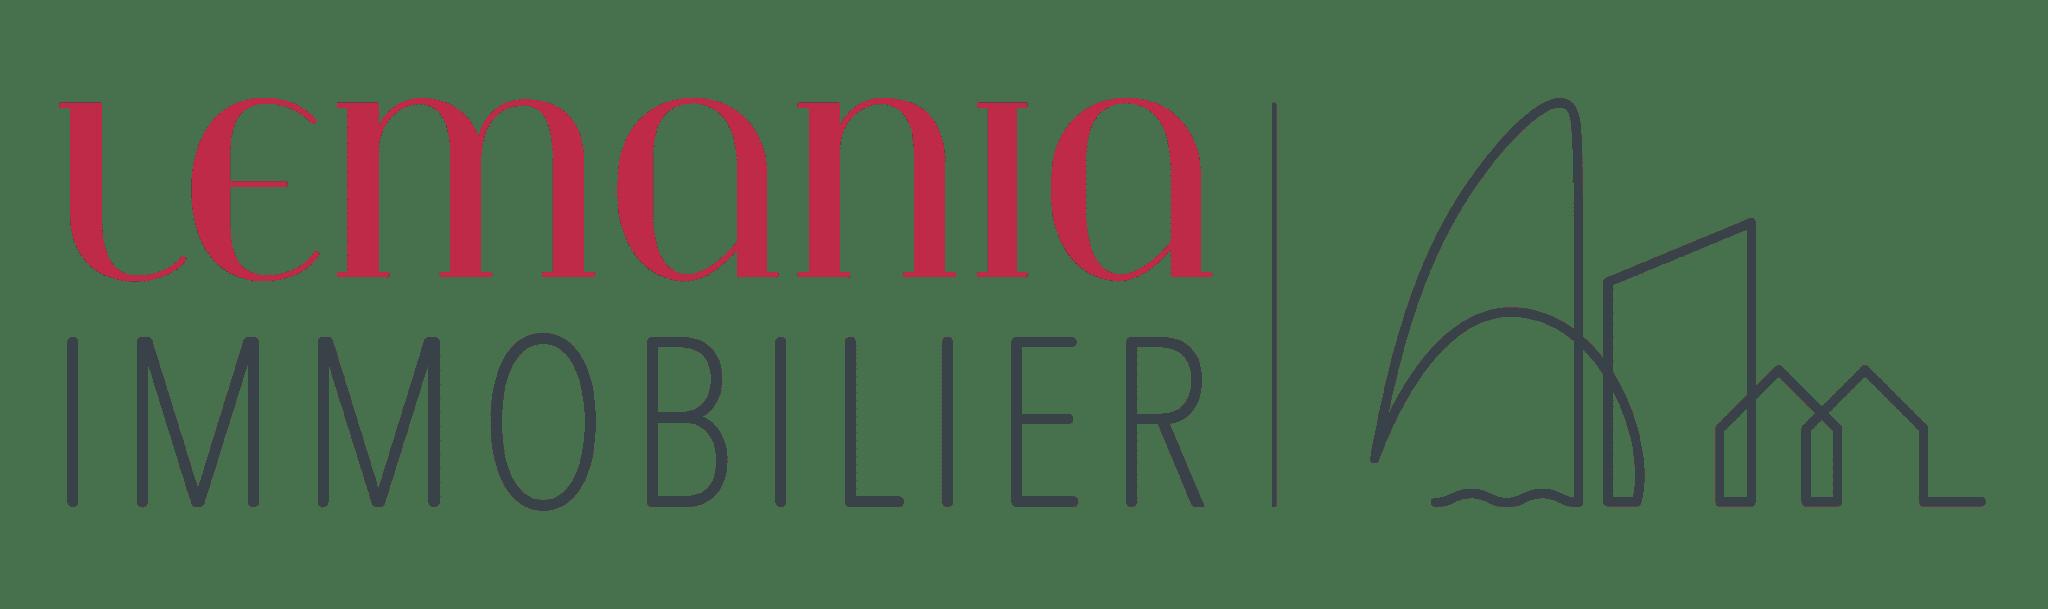 logo principal de Lemania immobilier